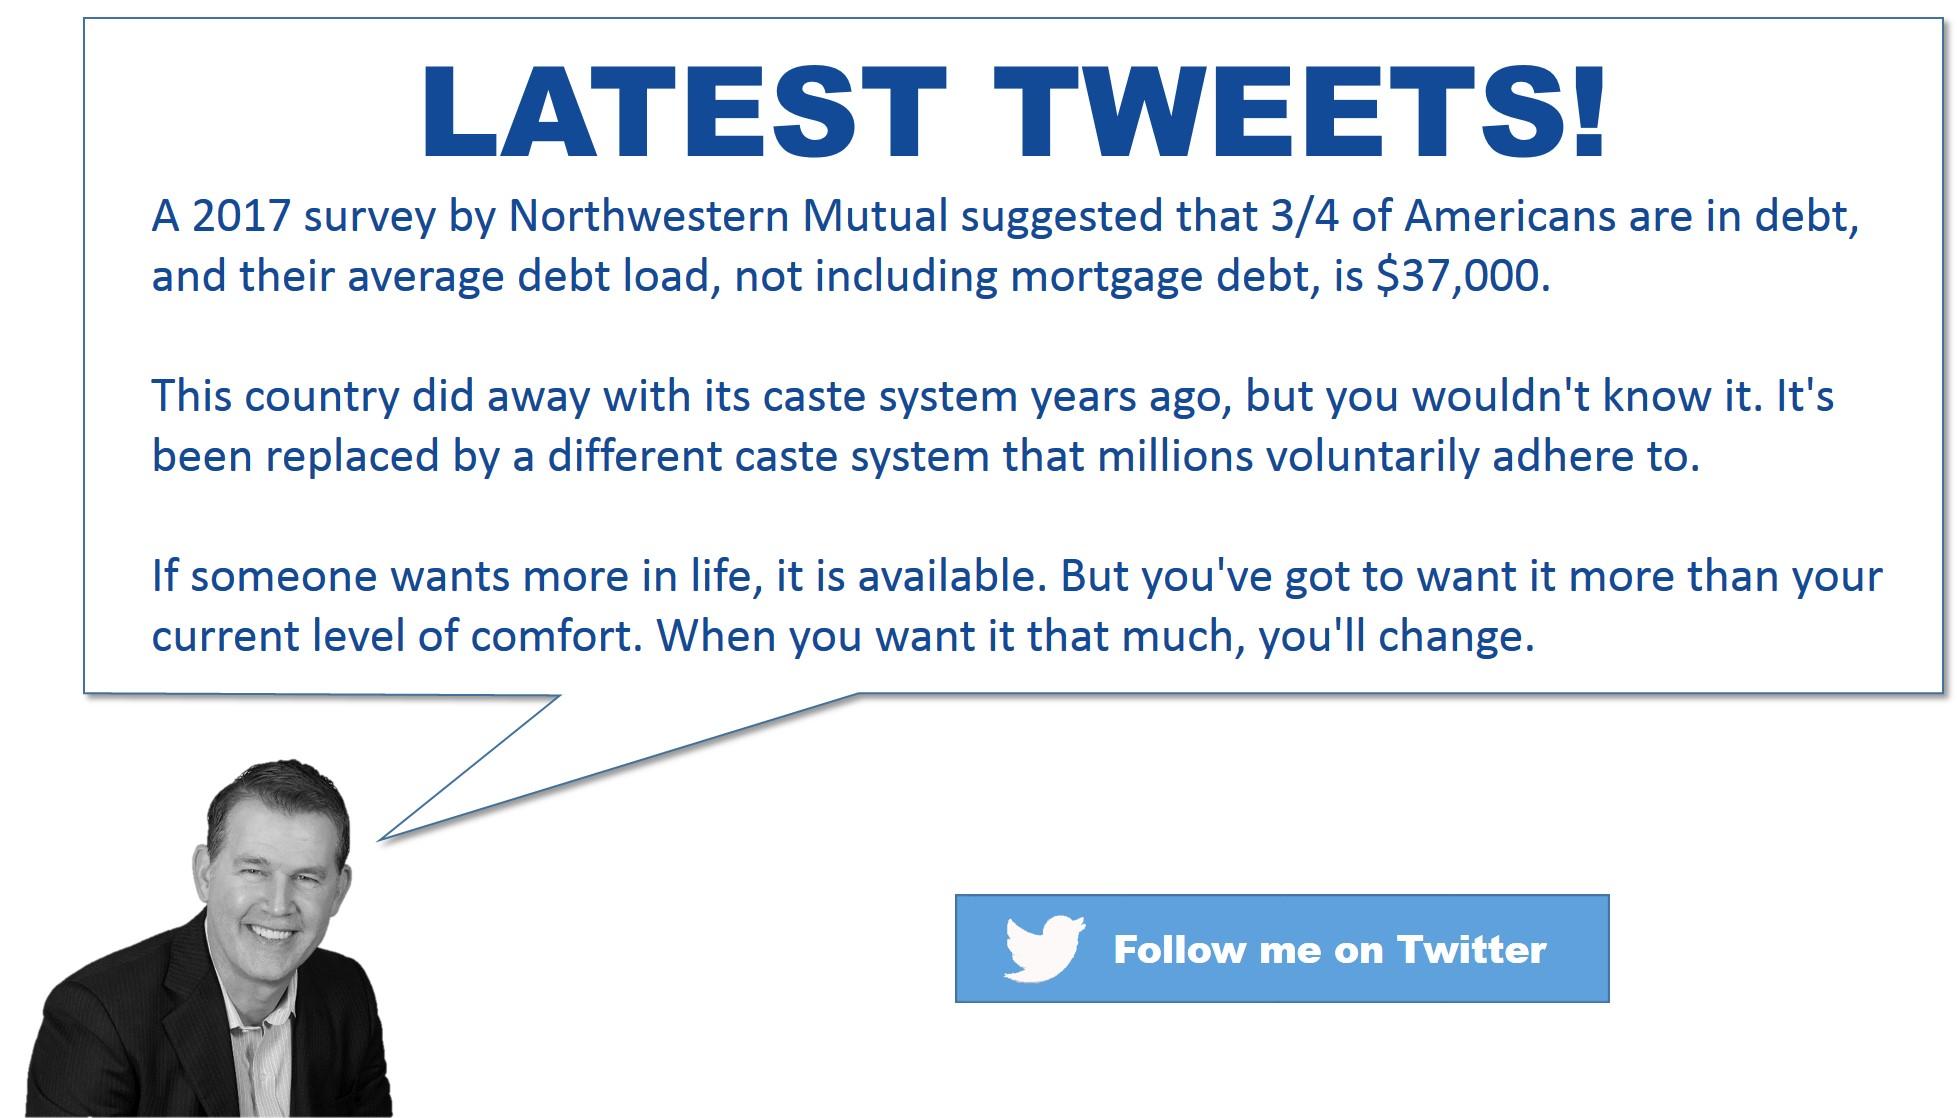 MontyCampbell-Tweets-4-28-18-3